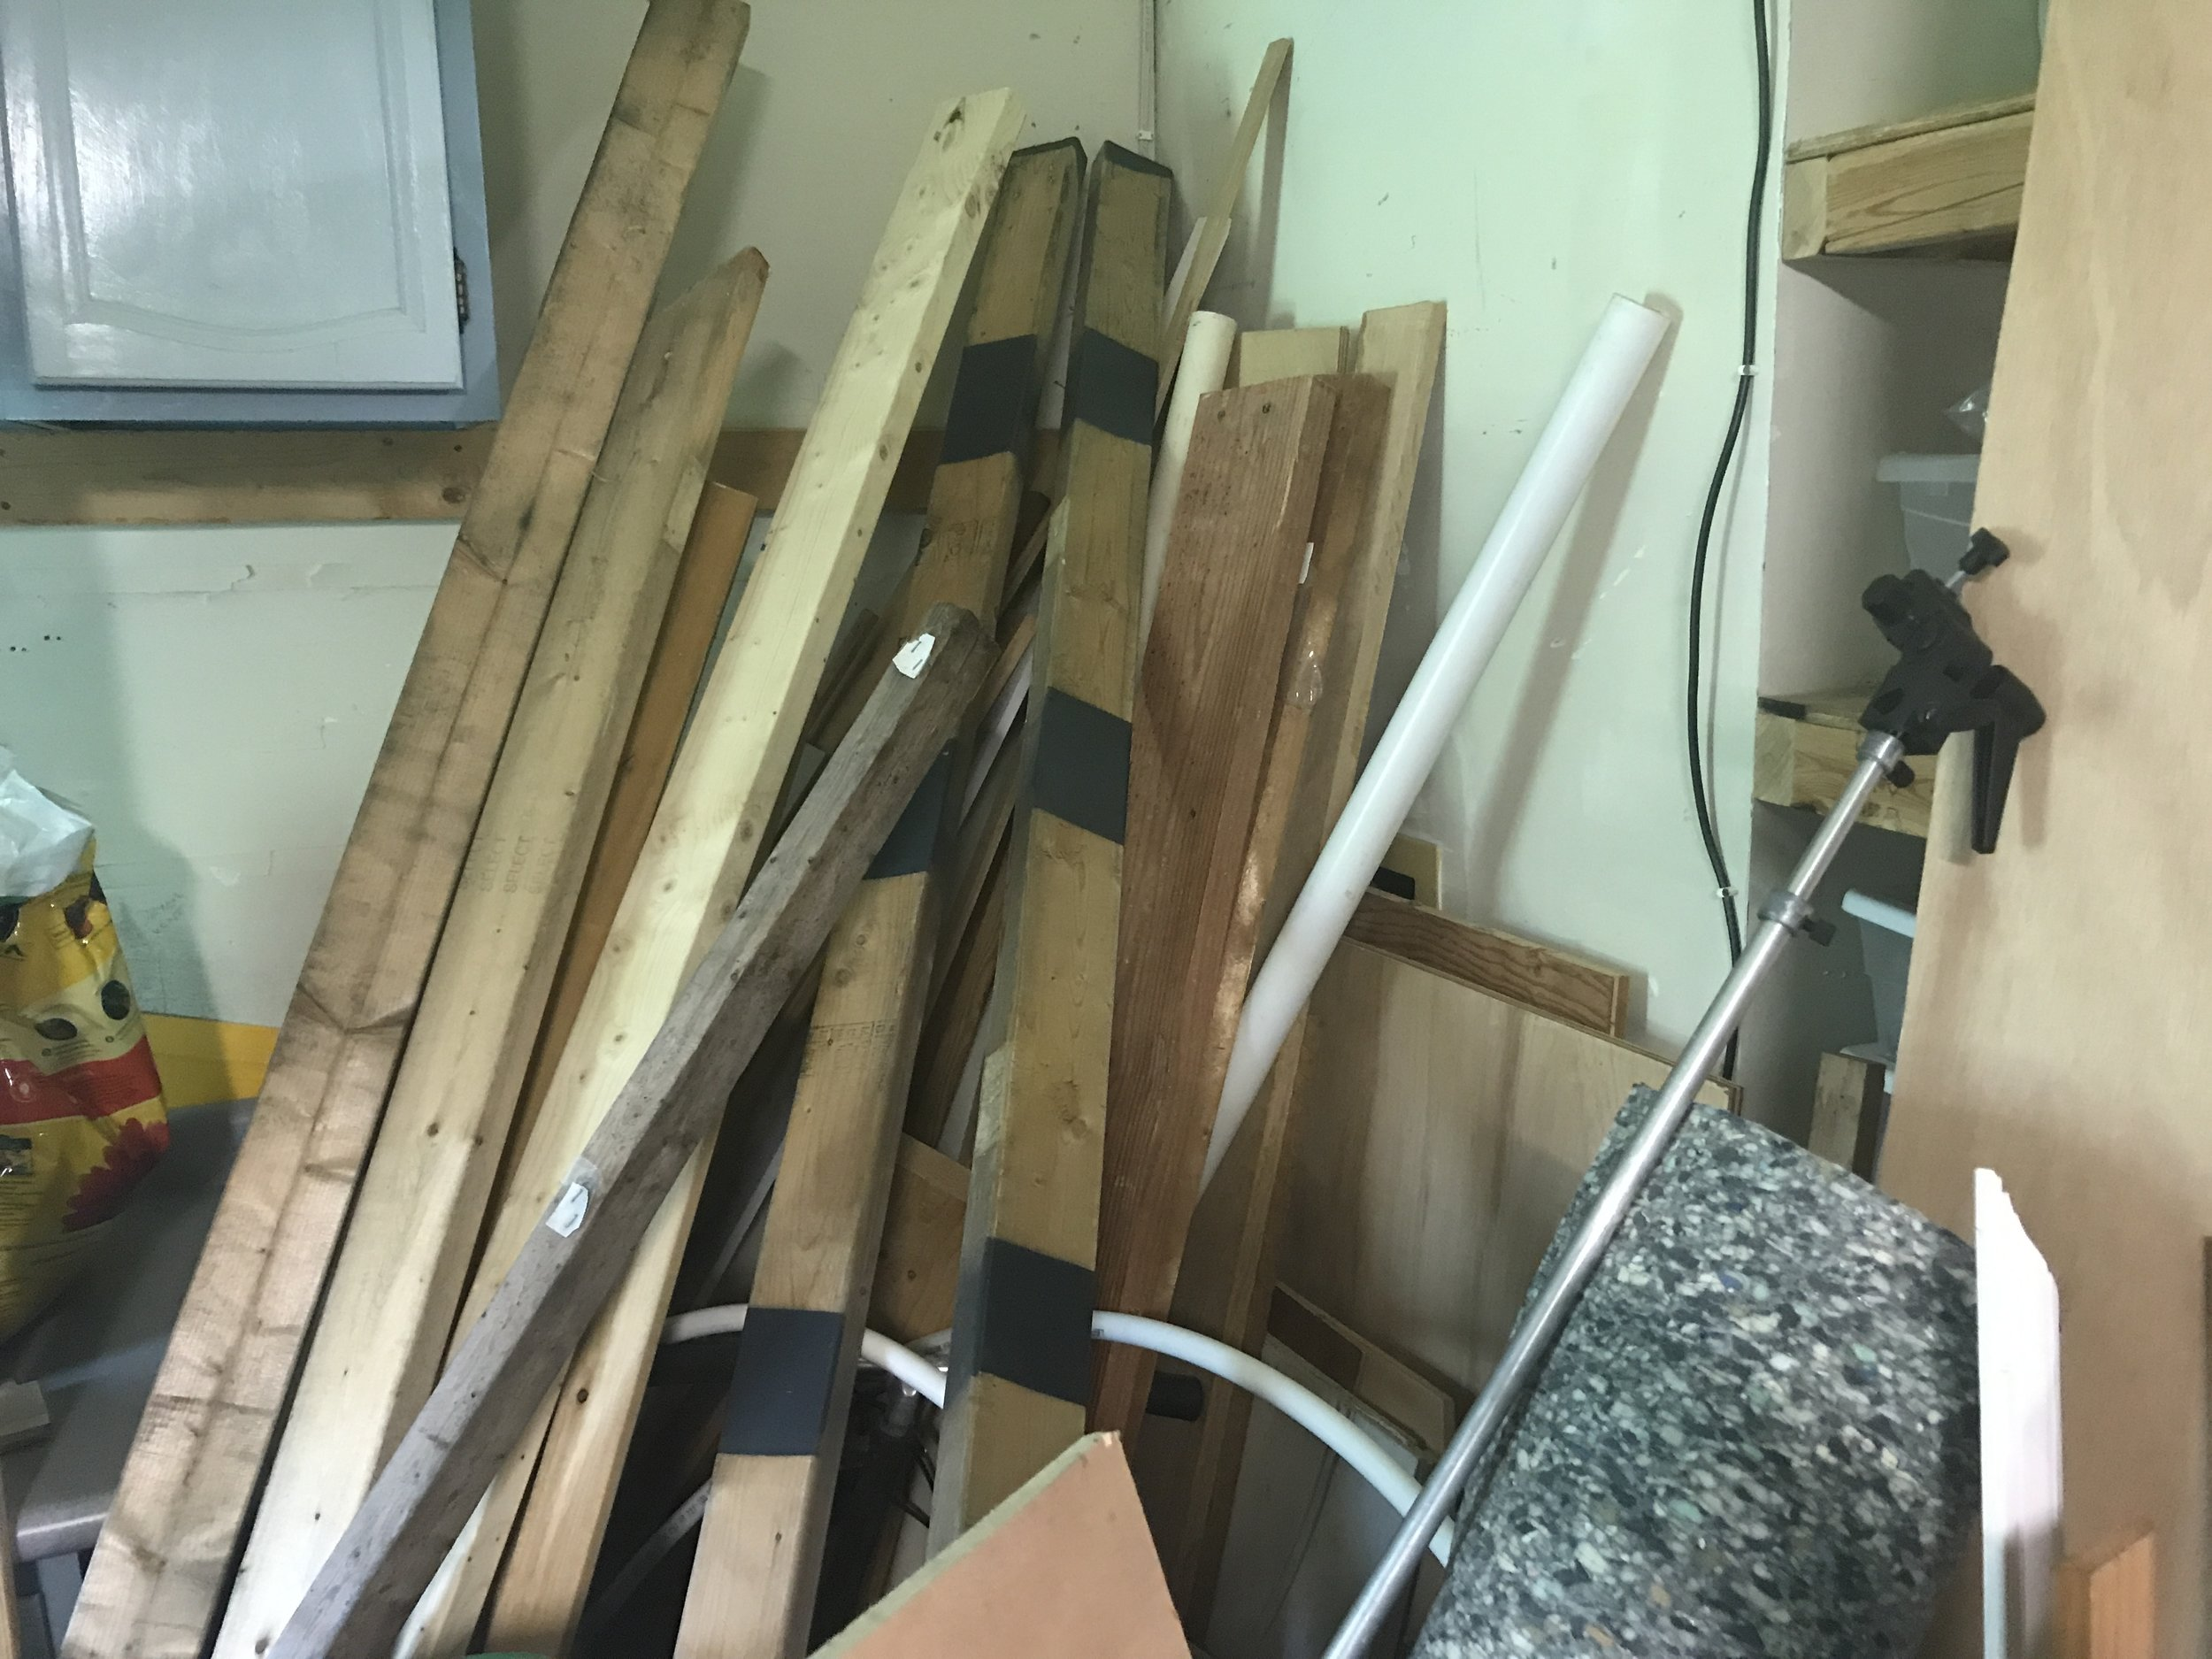 More wood.